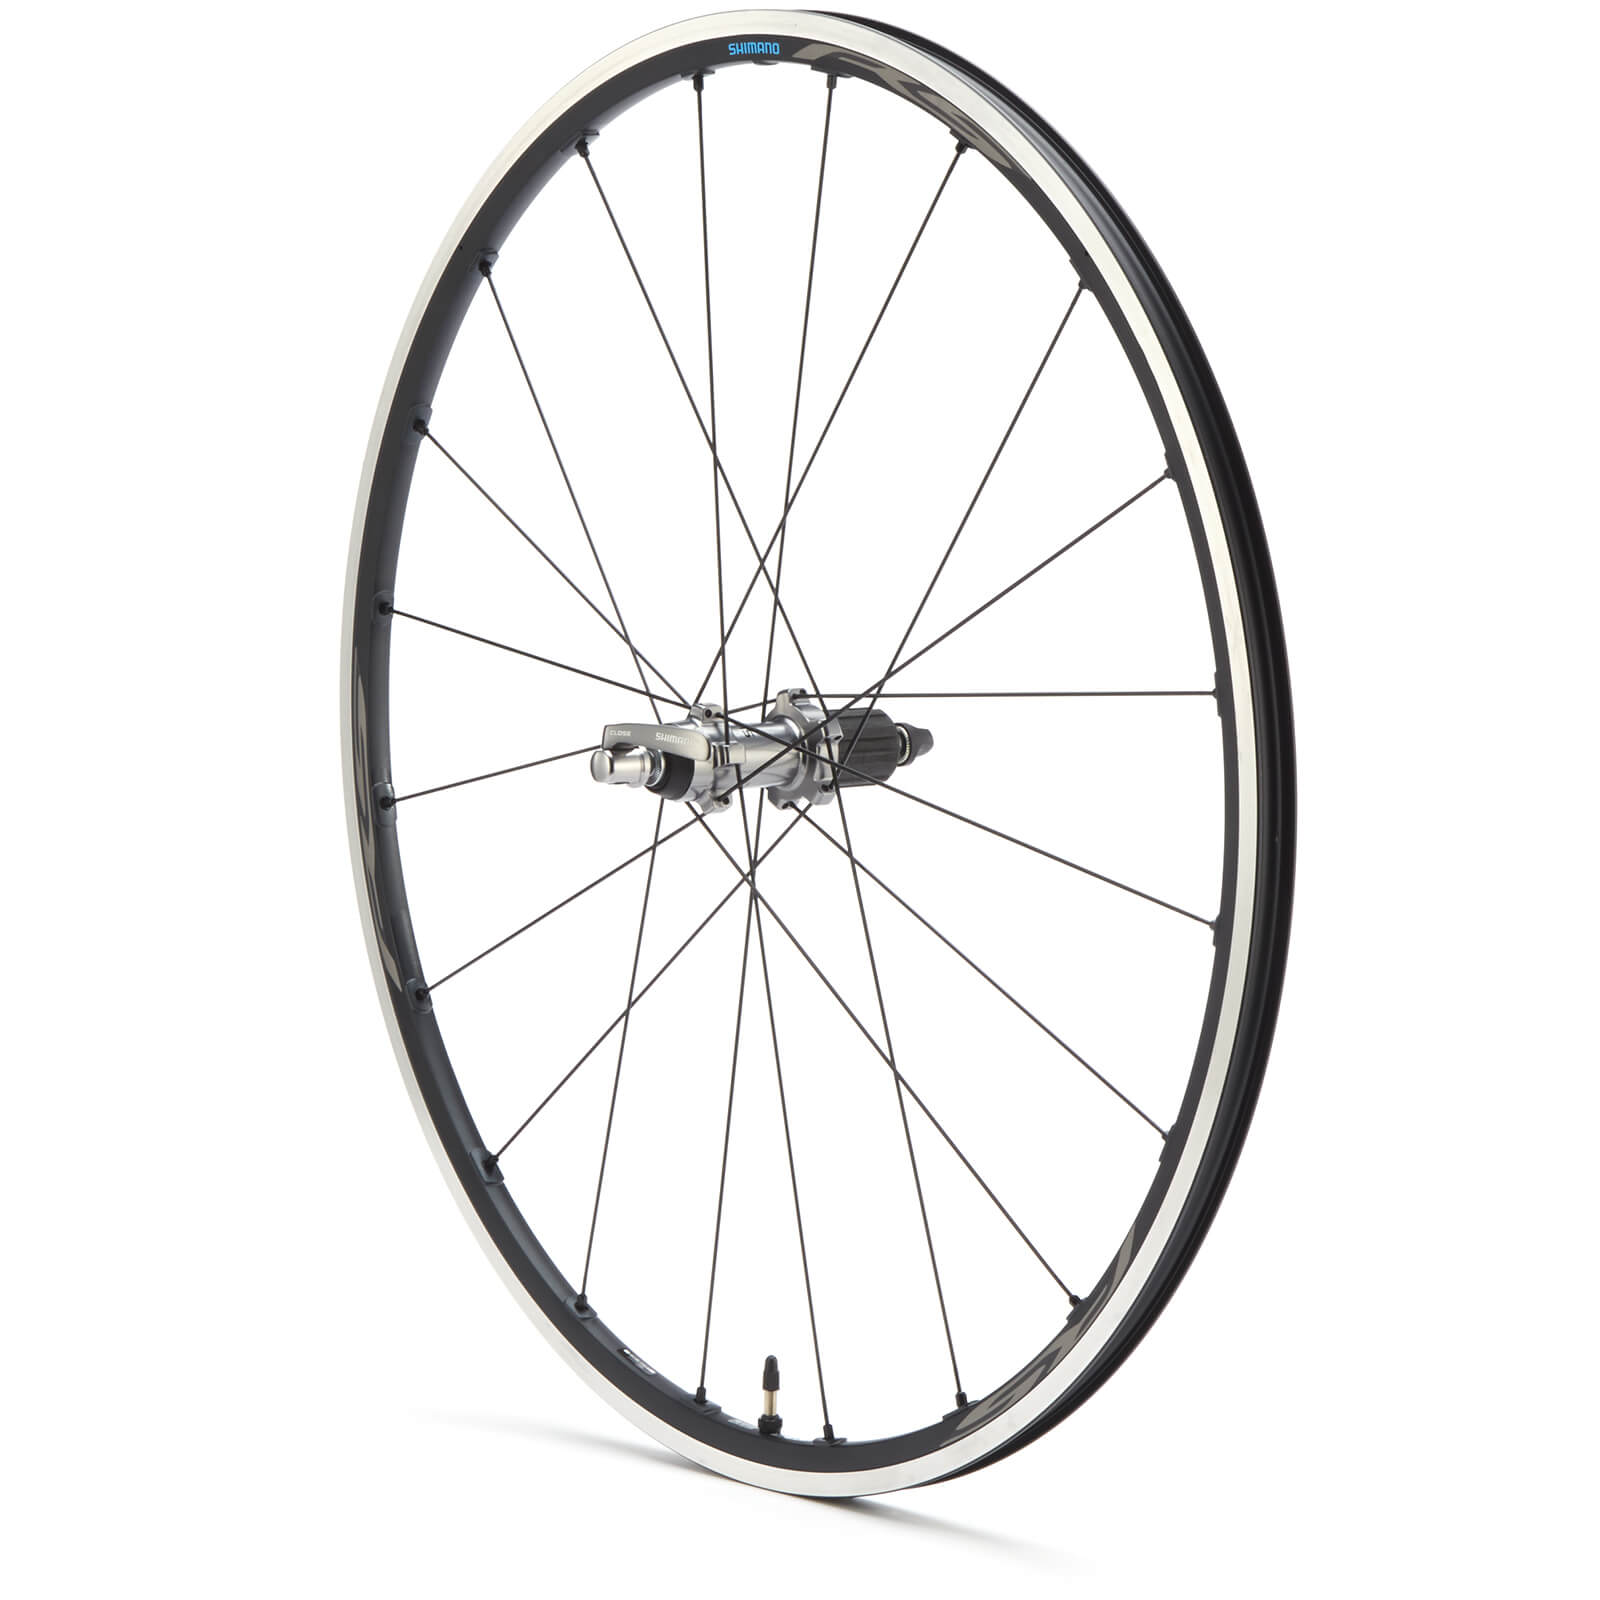 Shimano Ultegra Rs500 Rear Wheel